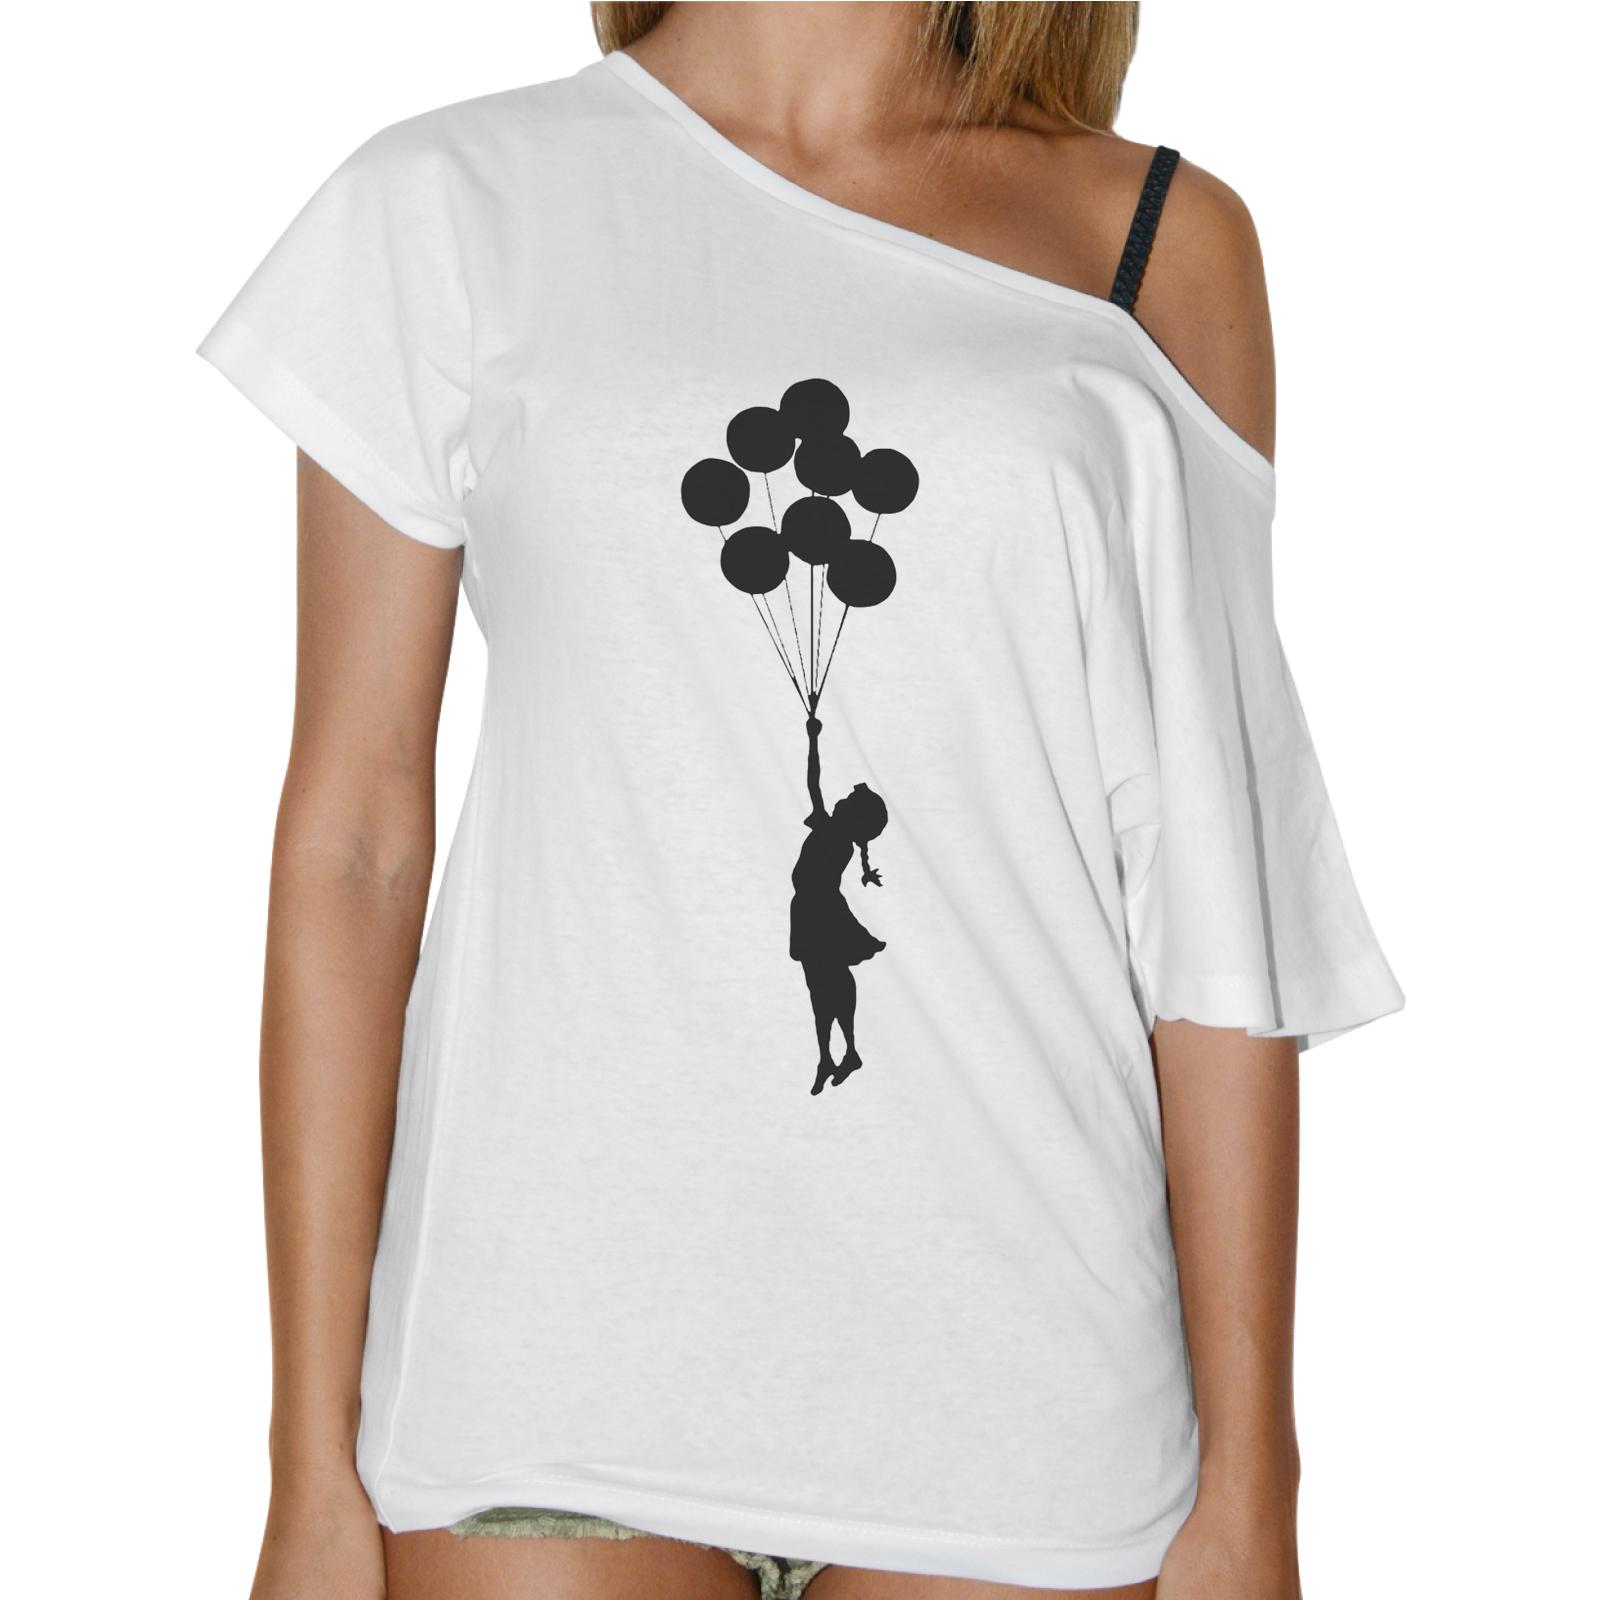 T-Shirt Donna Collo Barca BAMBINA PALLONCINI